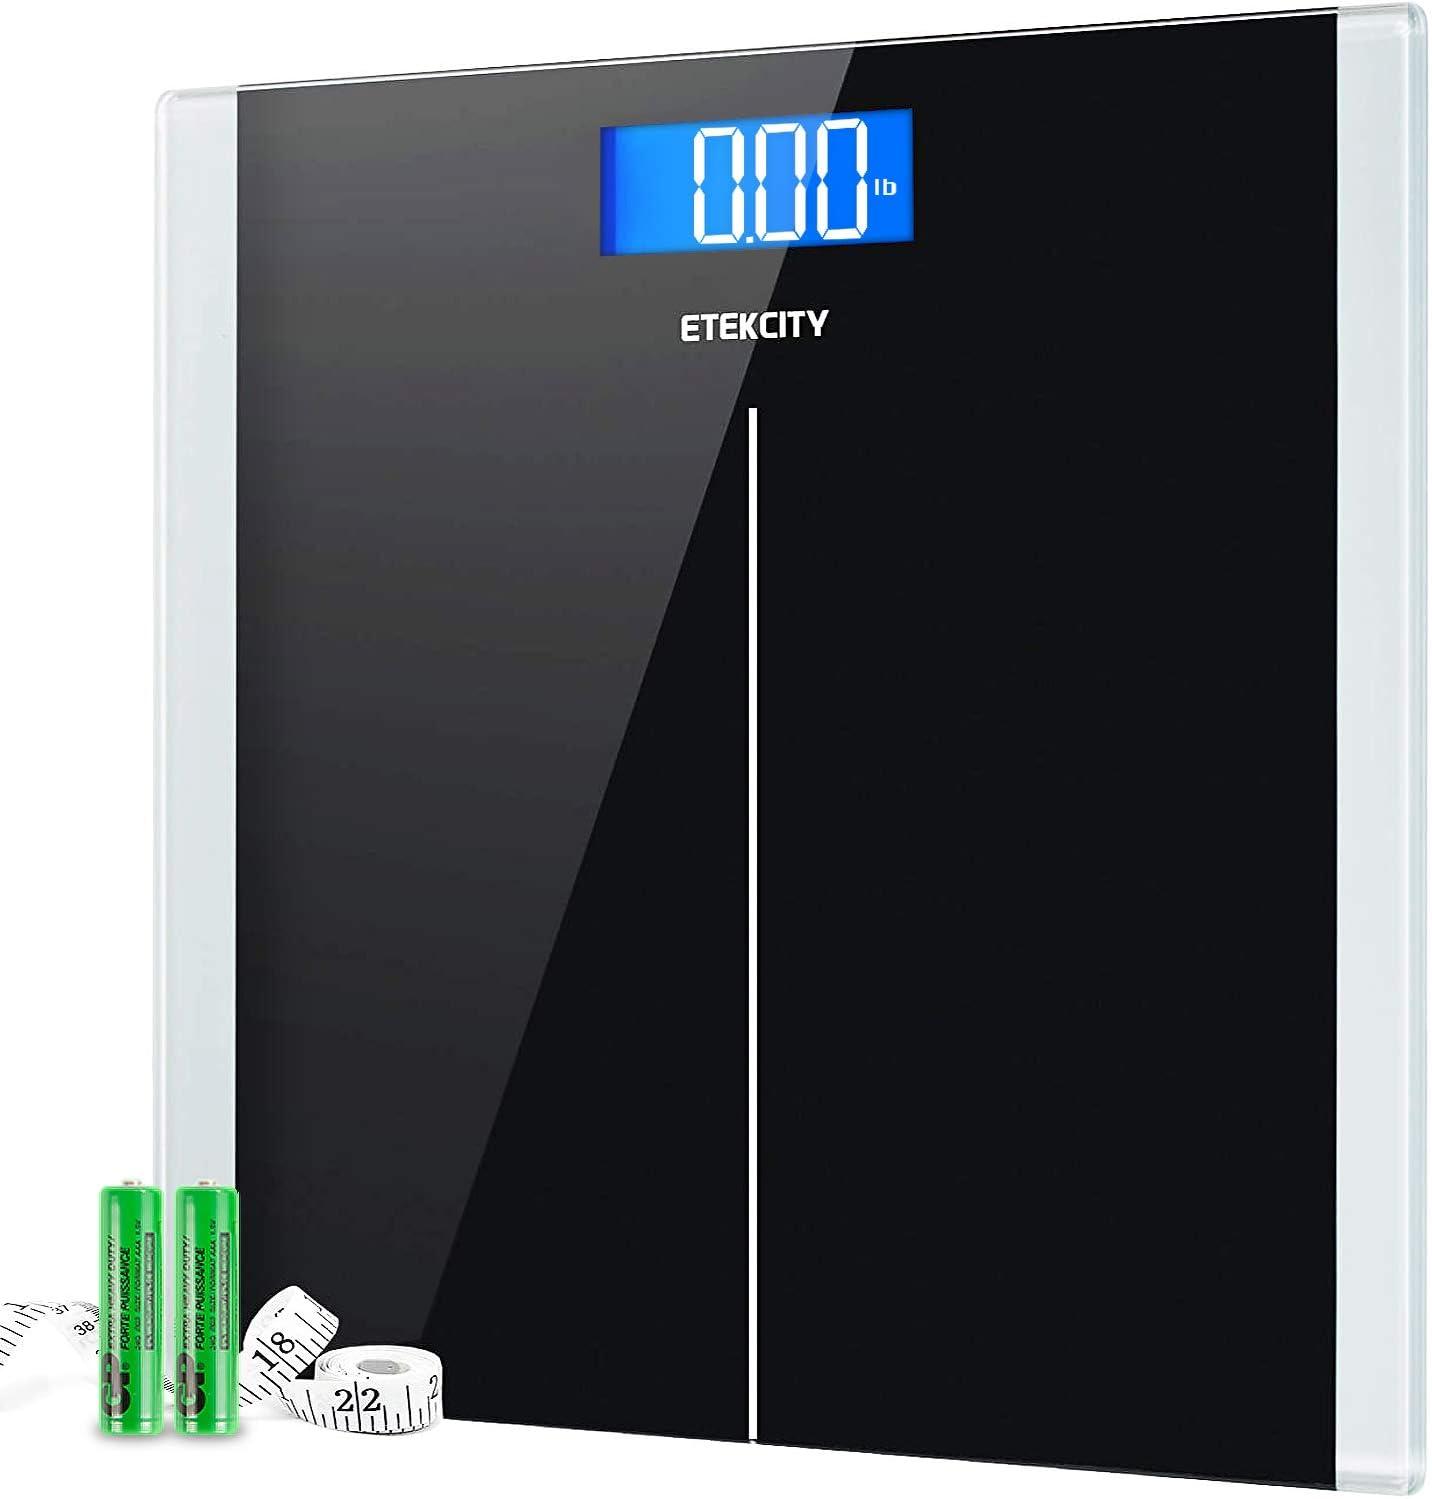 Etekcity 400 Lb Digital Body Weight Bathroom Scale $16.99 Coupon